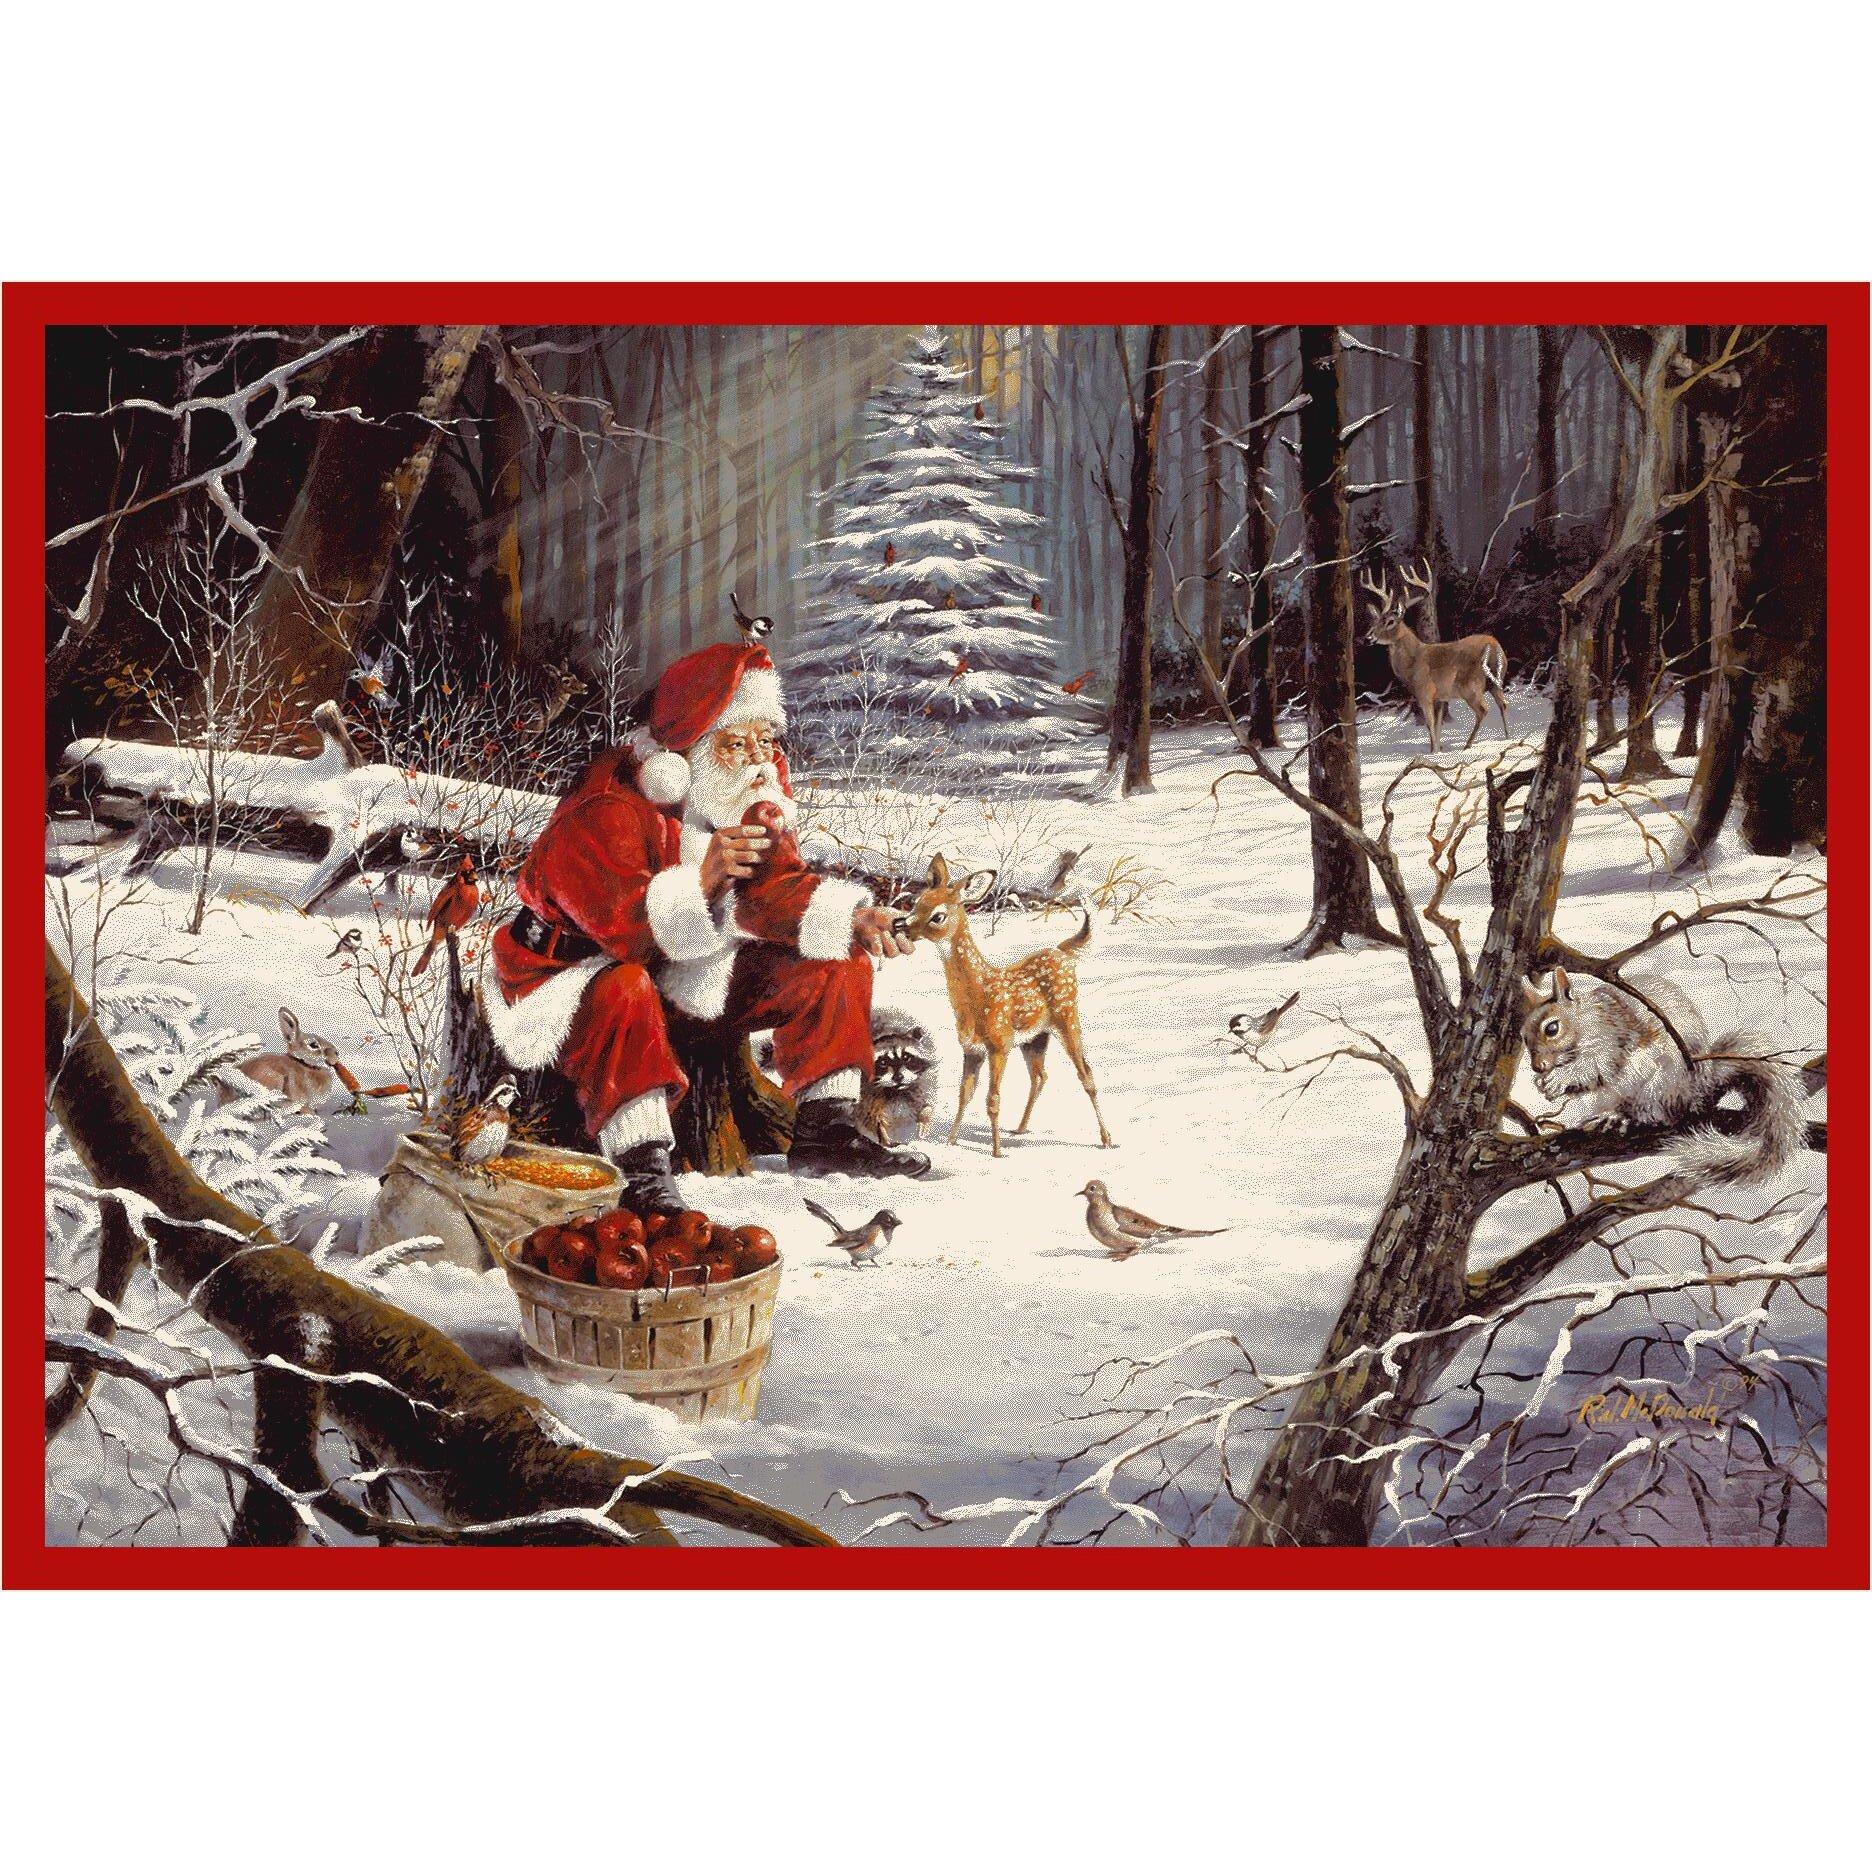 Milliken RJ McDonald Christmas Party Area Rug & Reviews